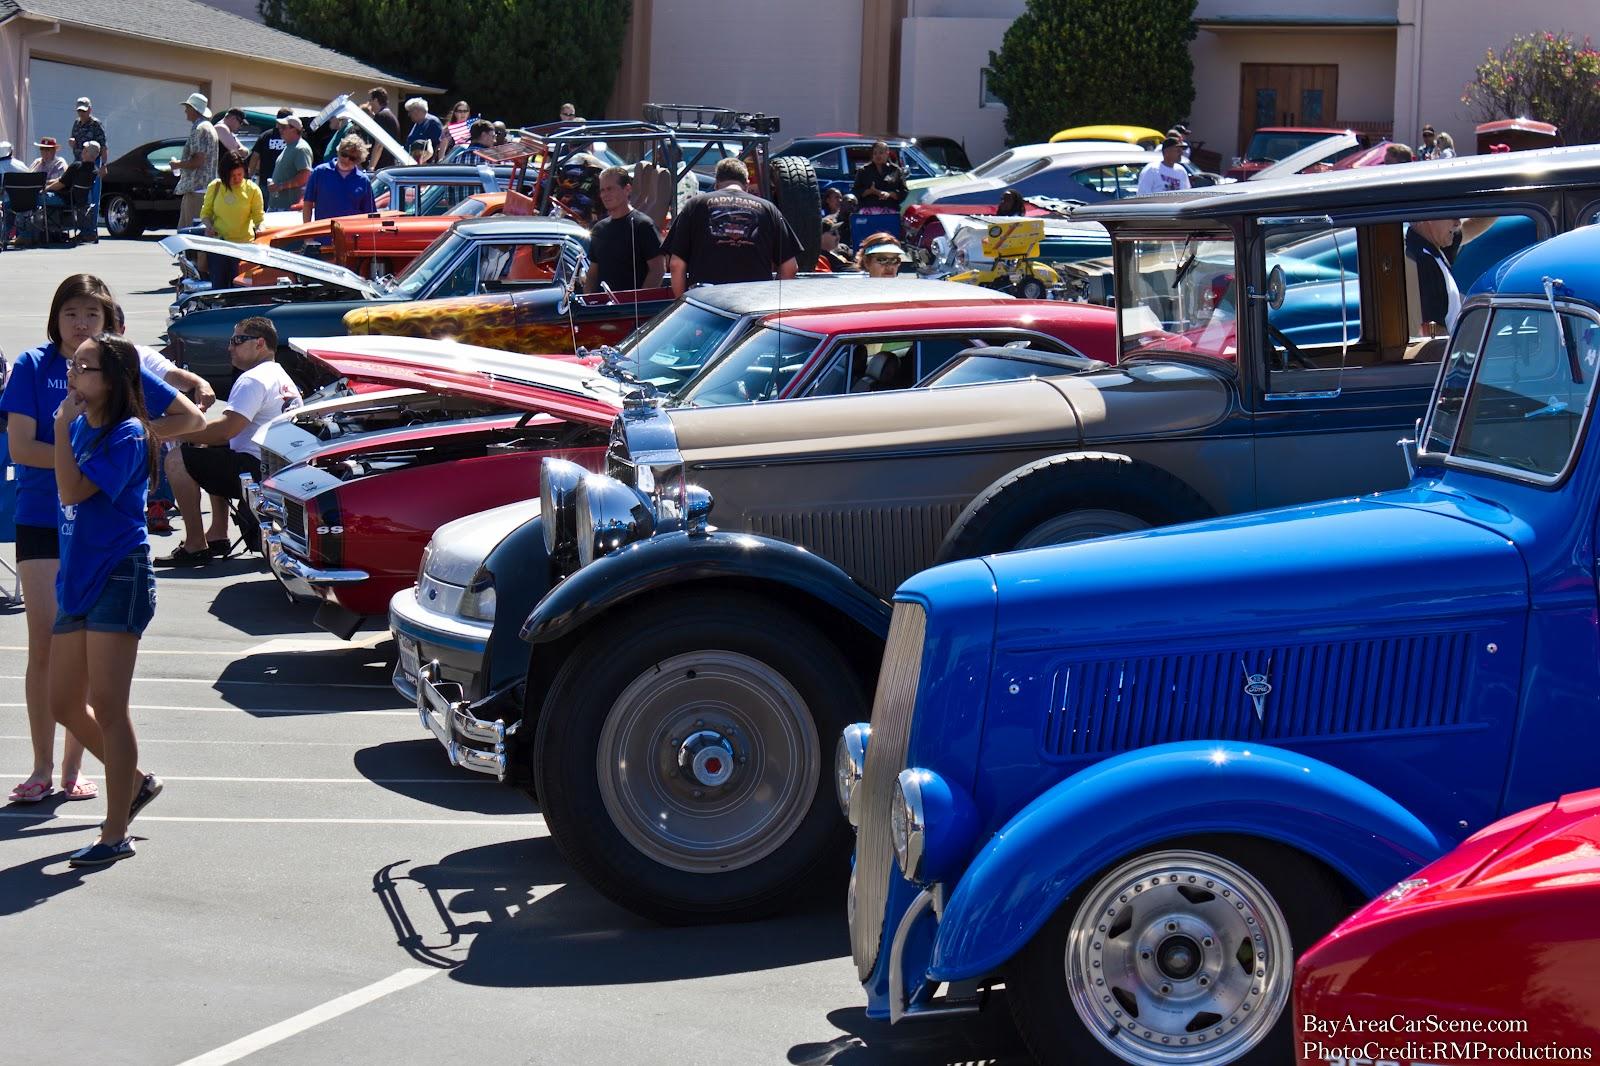 Bay Area Car Scene Millbrae Lions Club Millbrae Machines Car Show - Bay area car shows this weekend